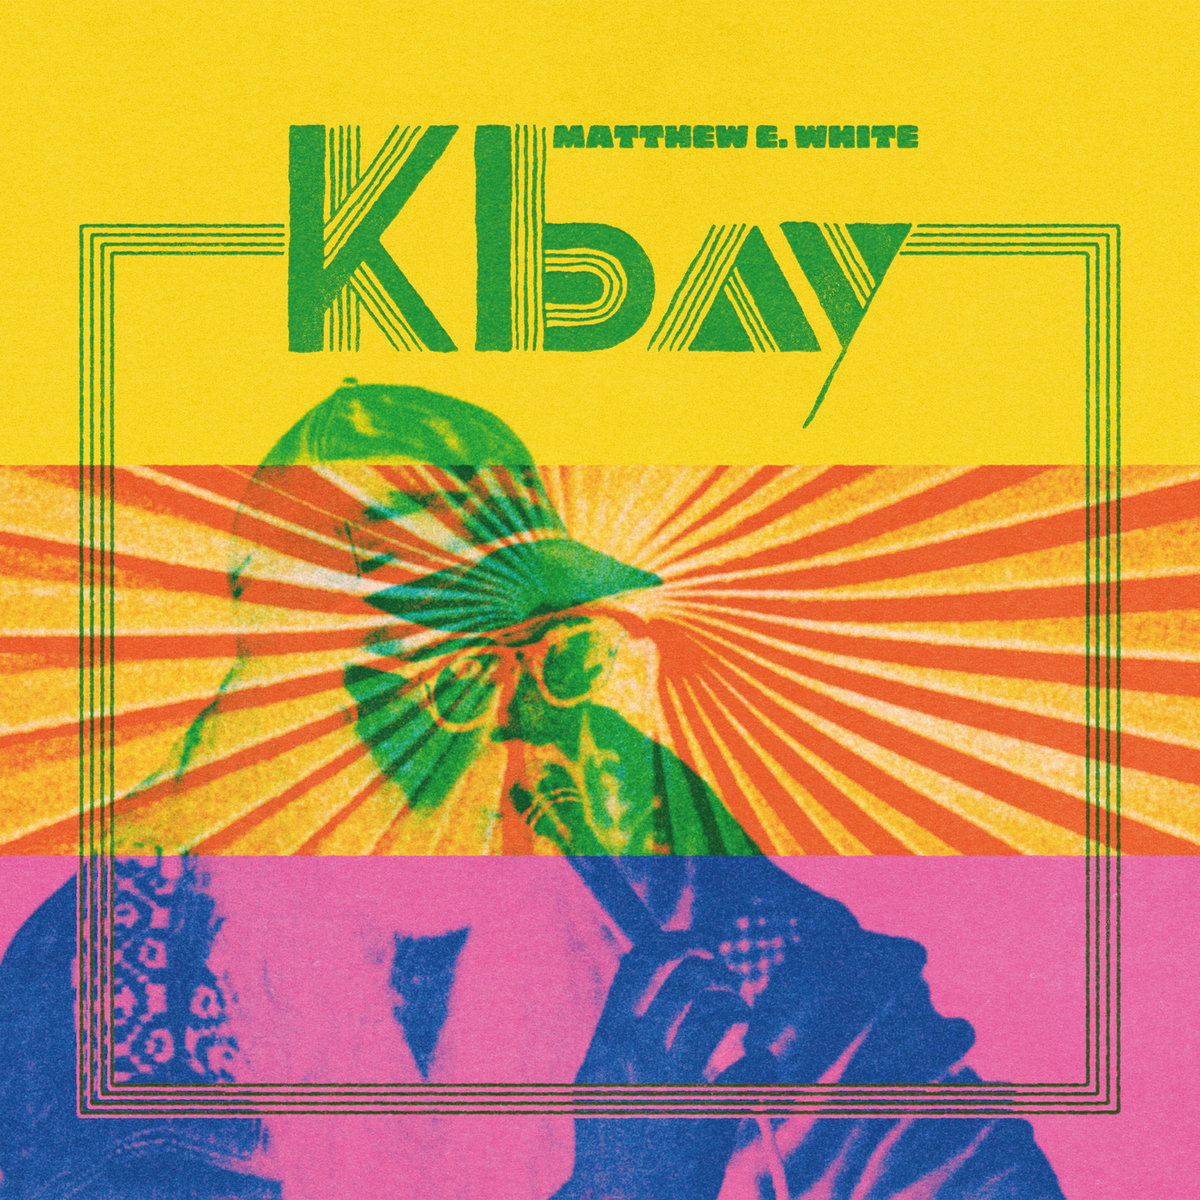 Matthew E. White - K Bay - Album Review - Loud And Quiet